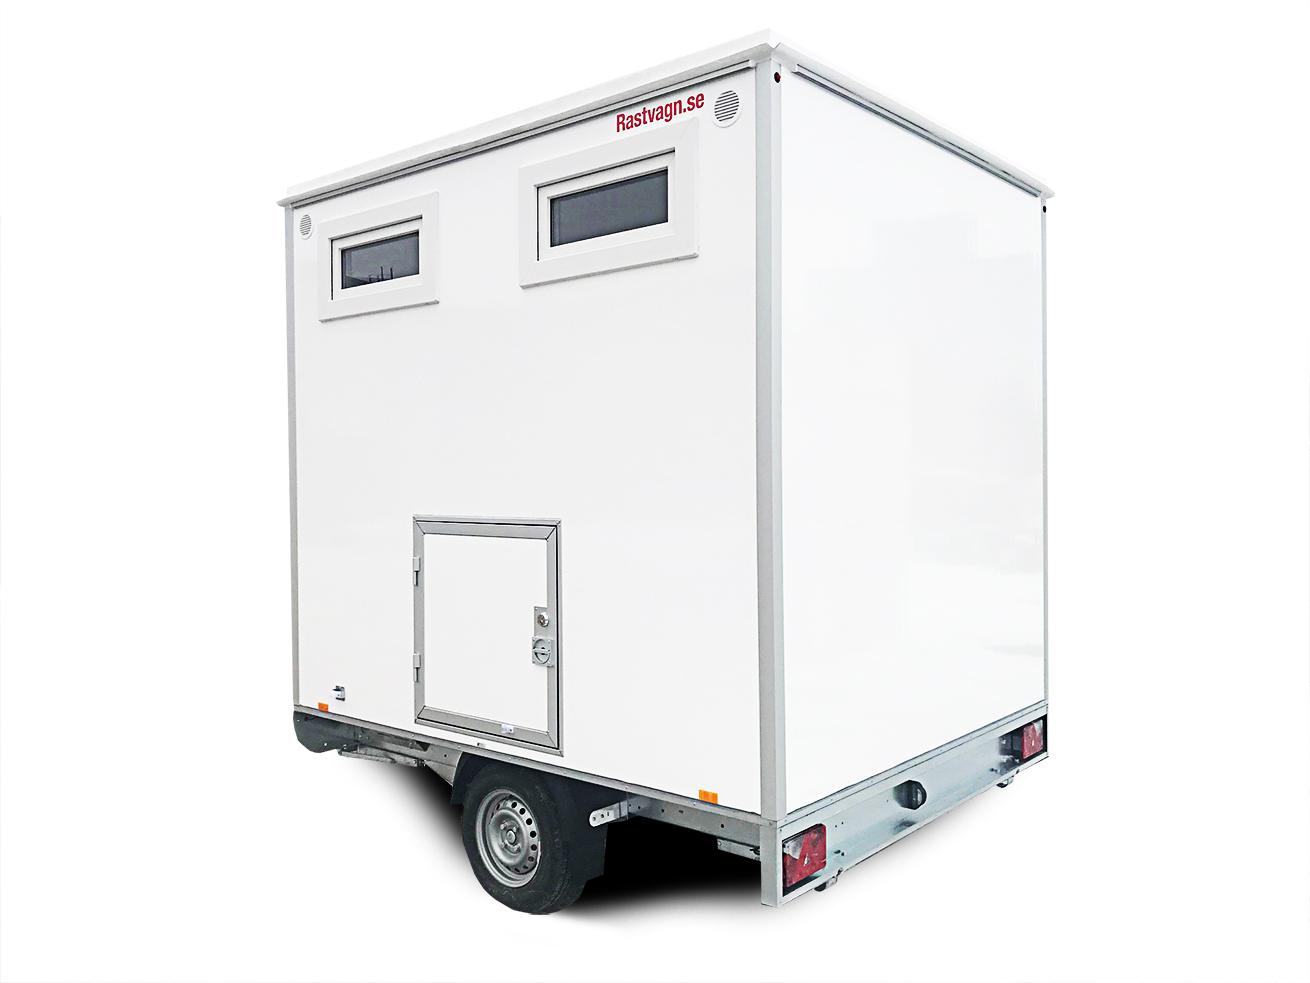 Toalettvagn 2P - Wanto Minitoa